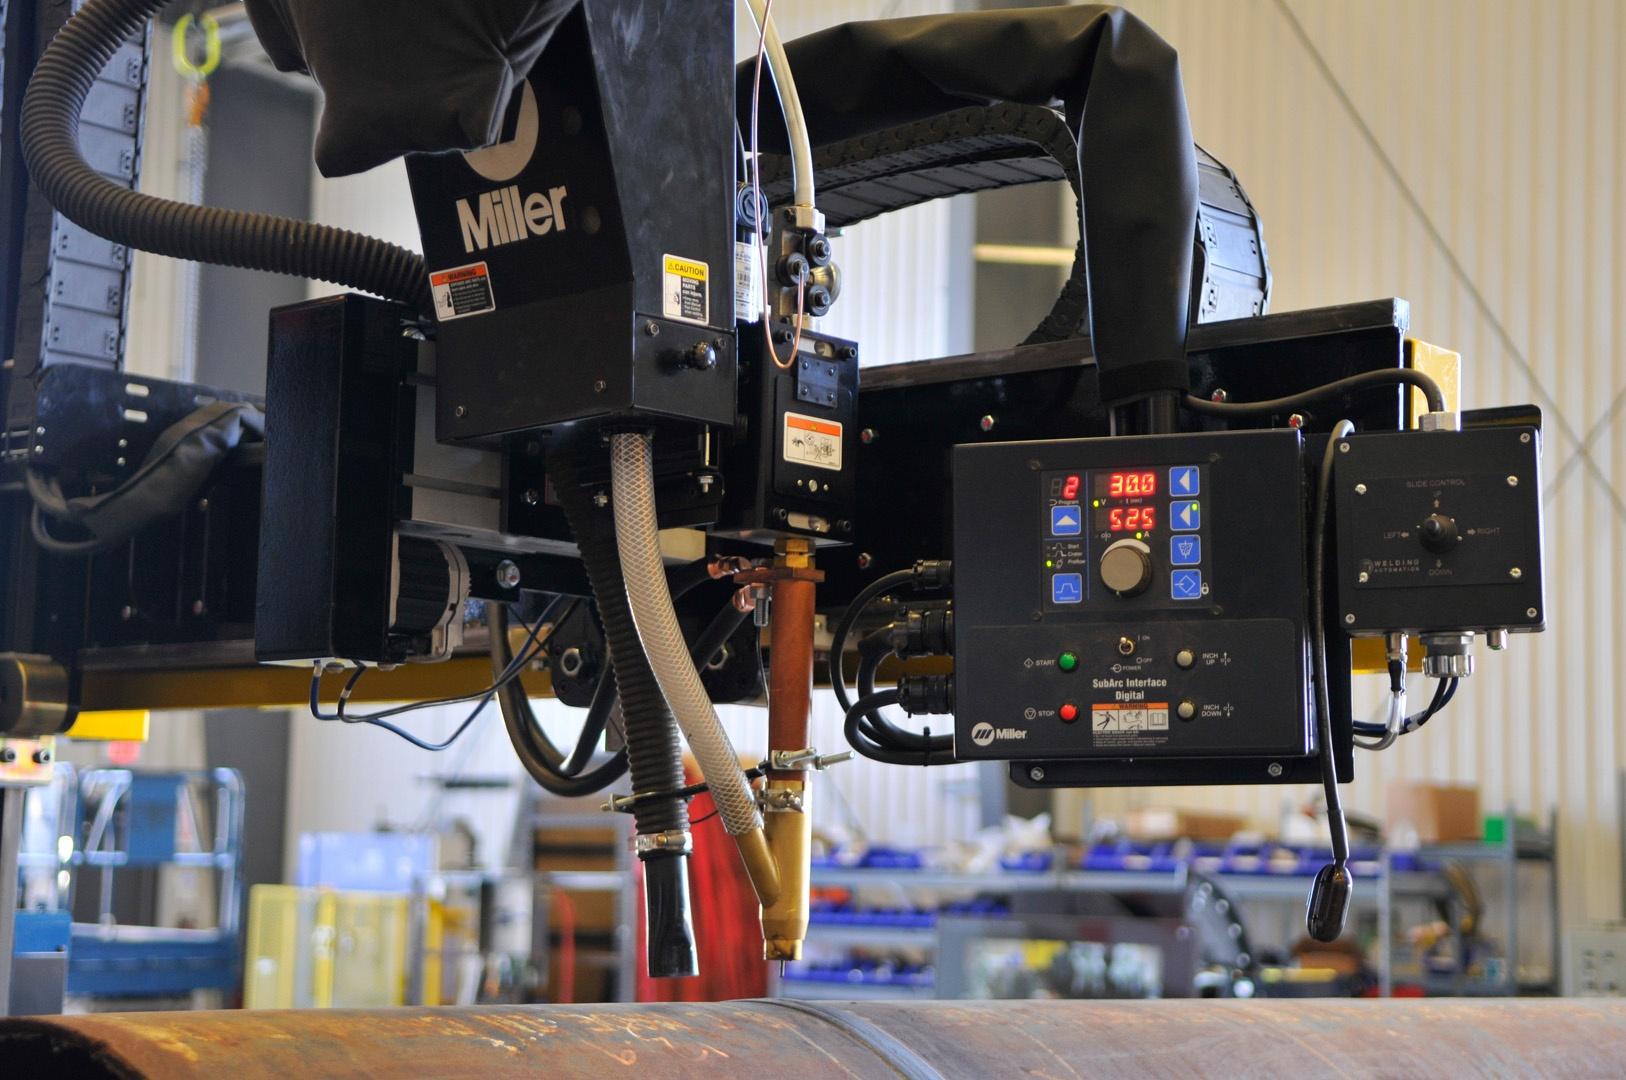 miller boom mounted controls for welding manipulator